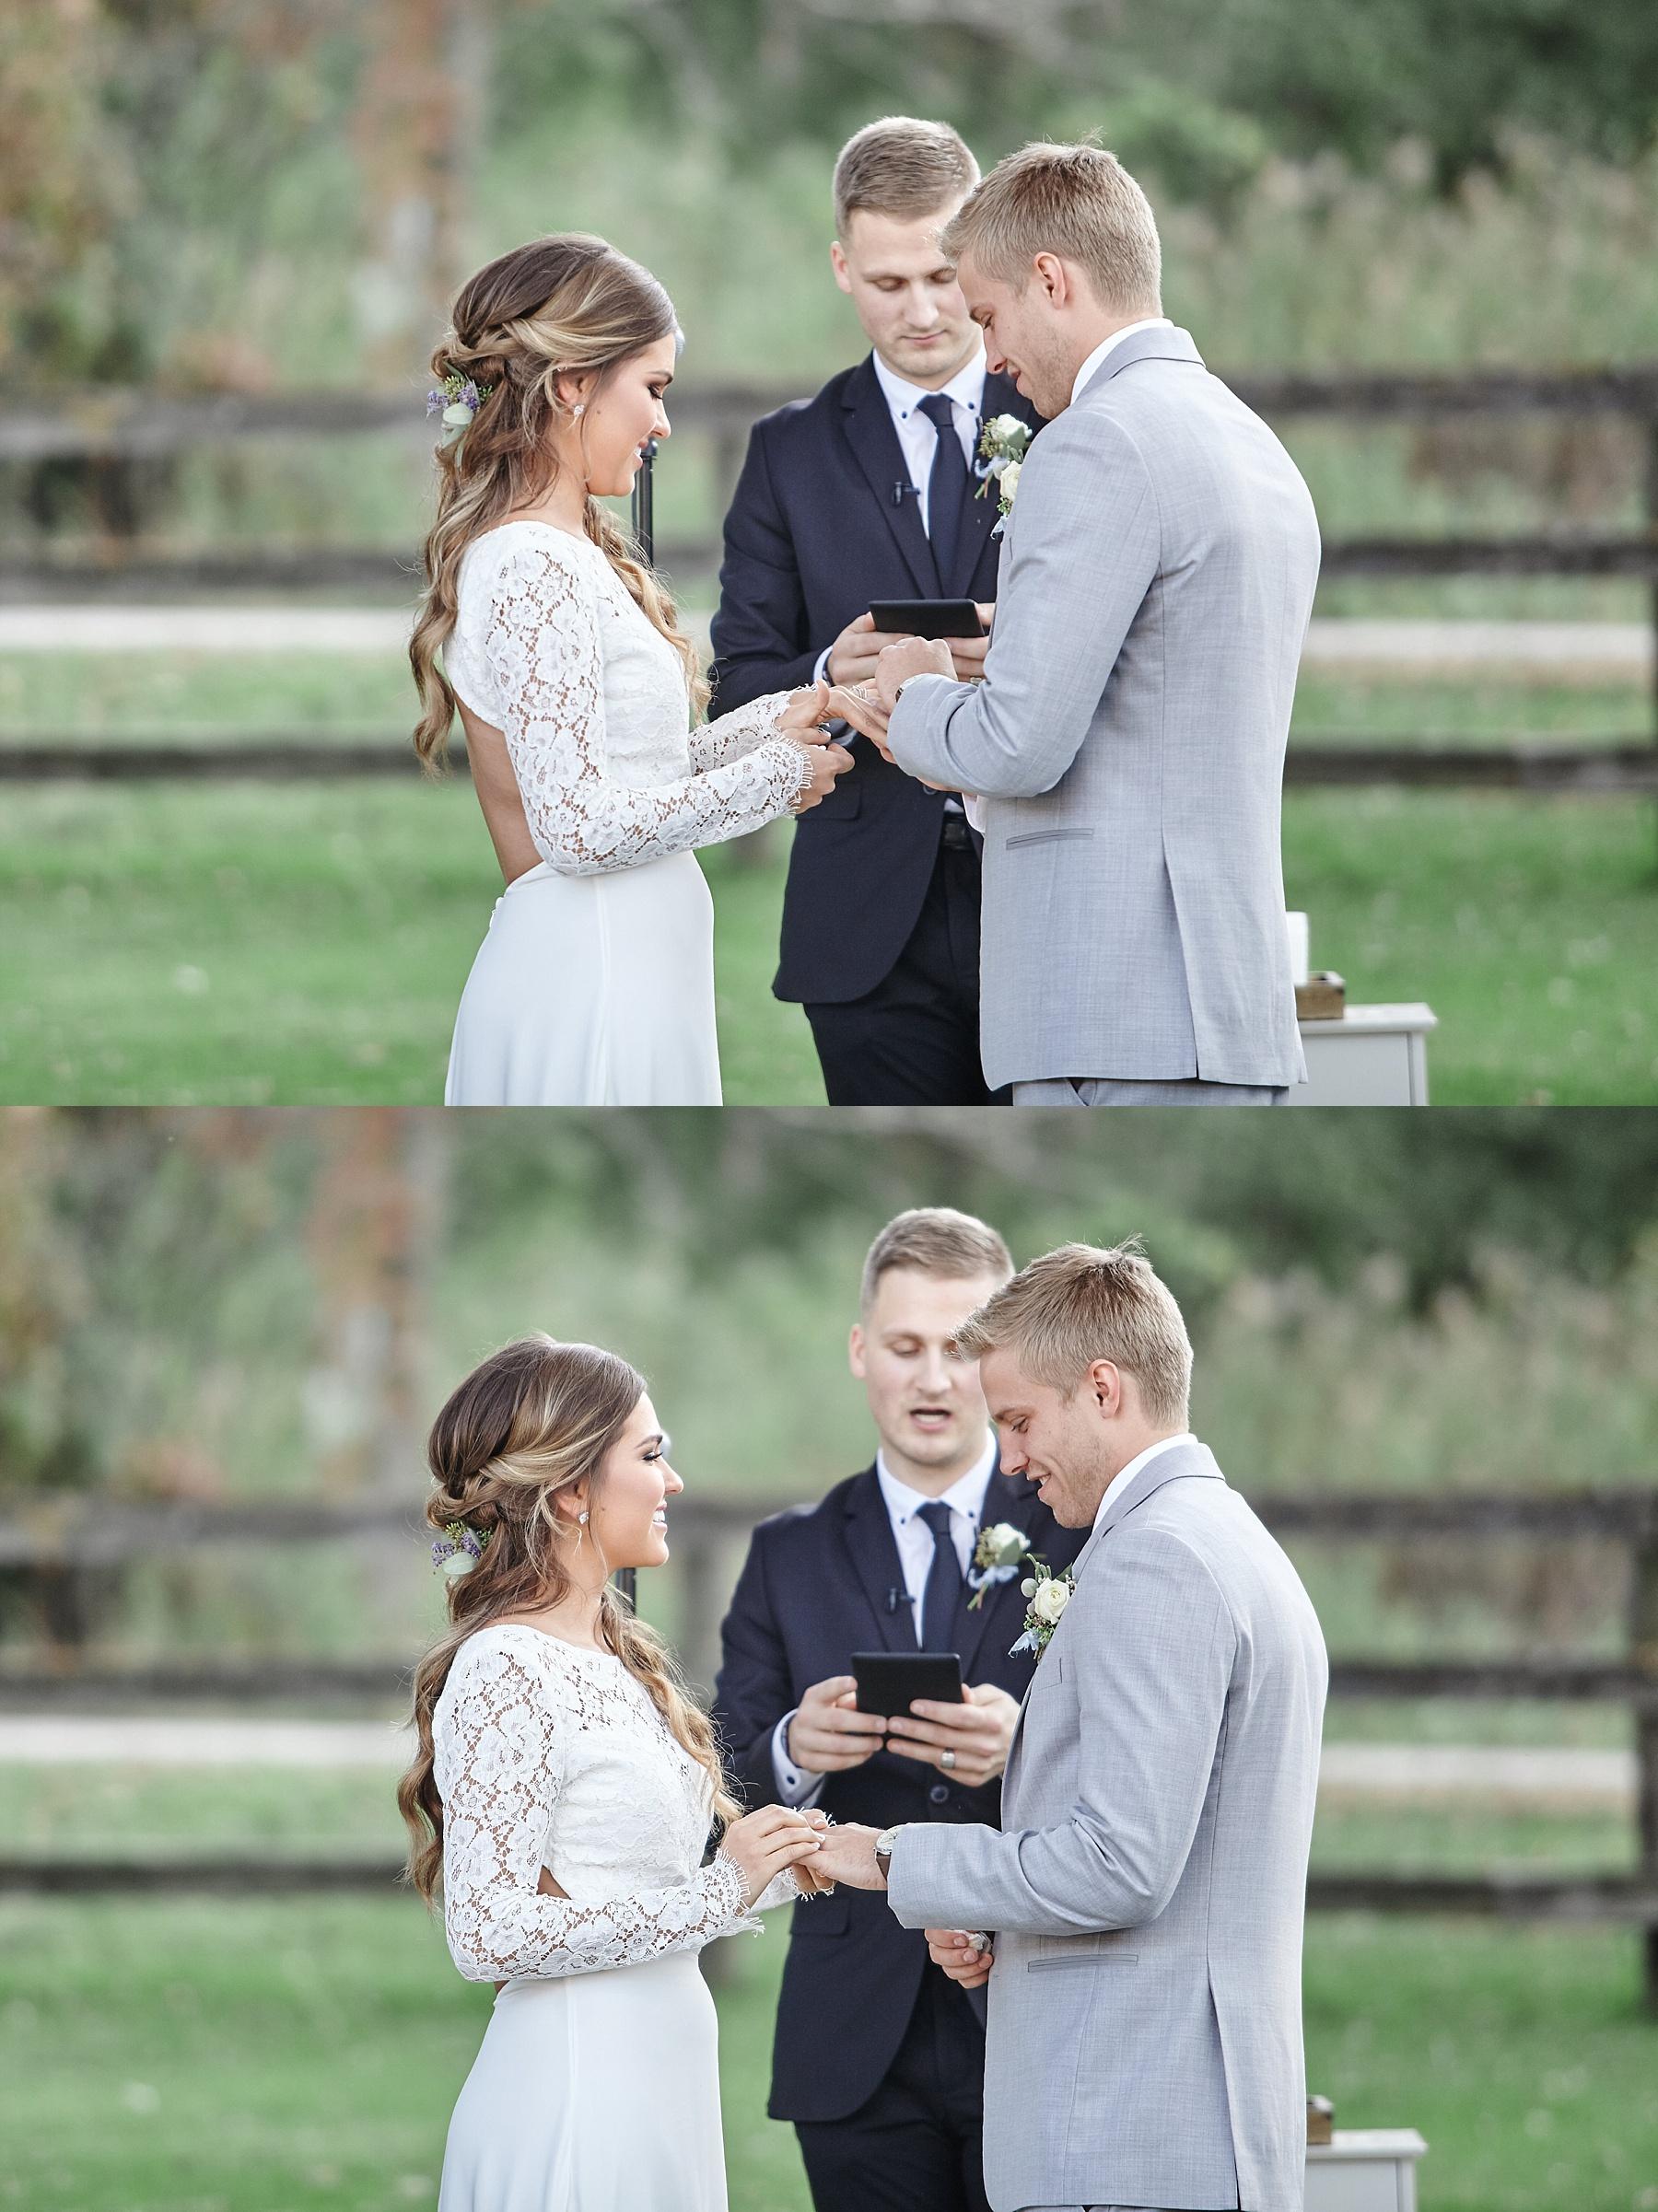 Maywood-Stone-Barn-Wedding-Rochester-Minnesota-Perry-James-Photo_0649.jpg